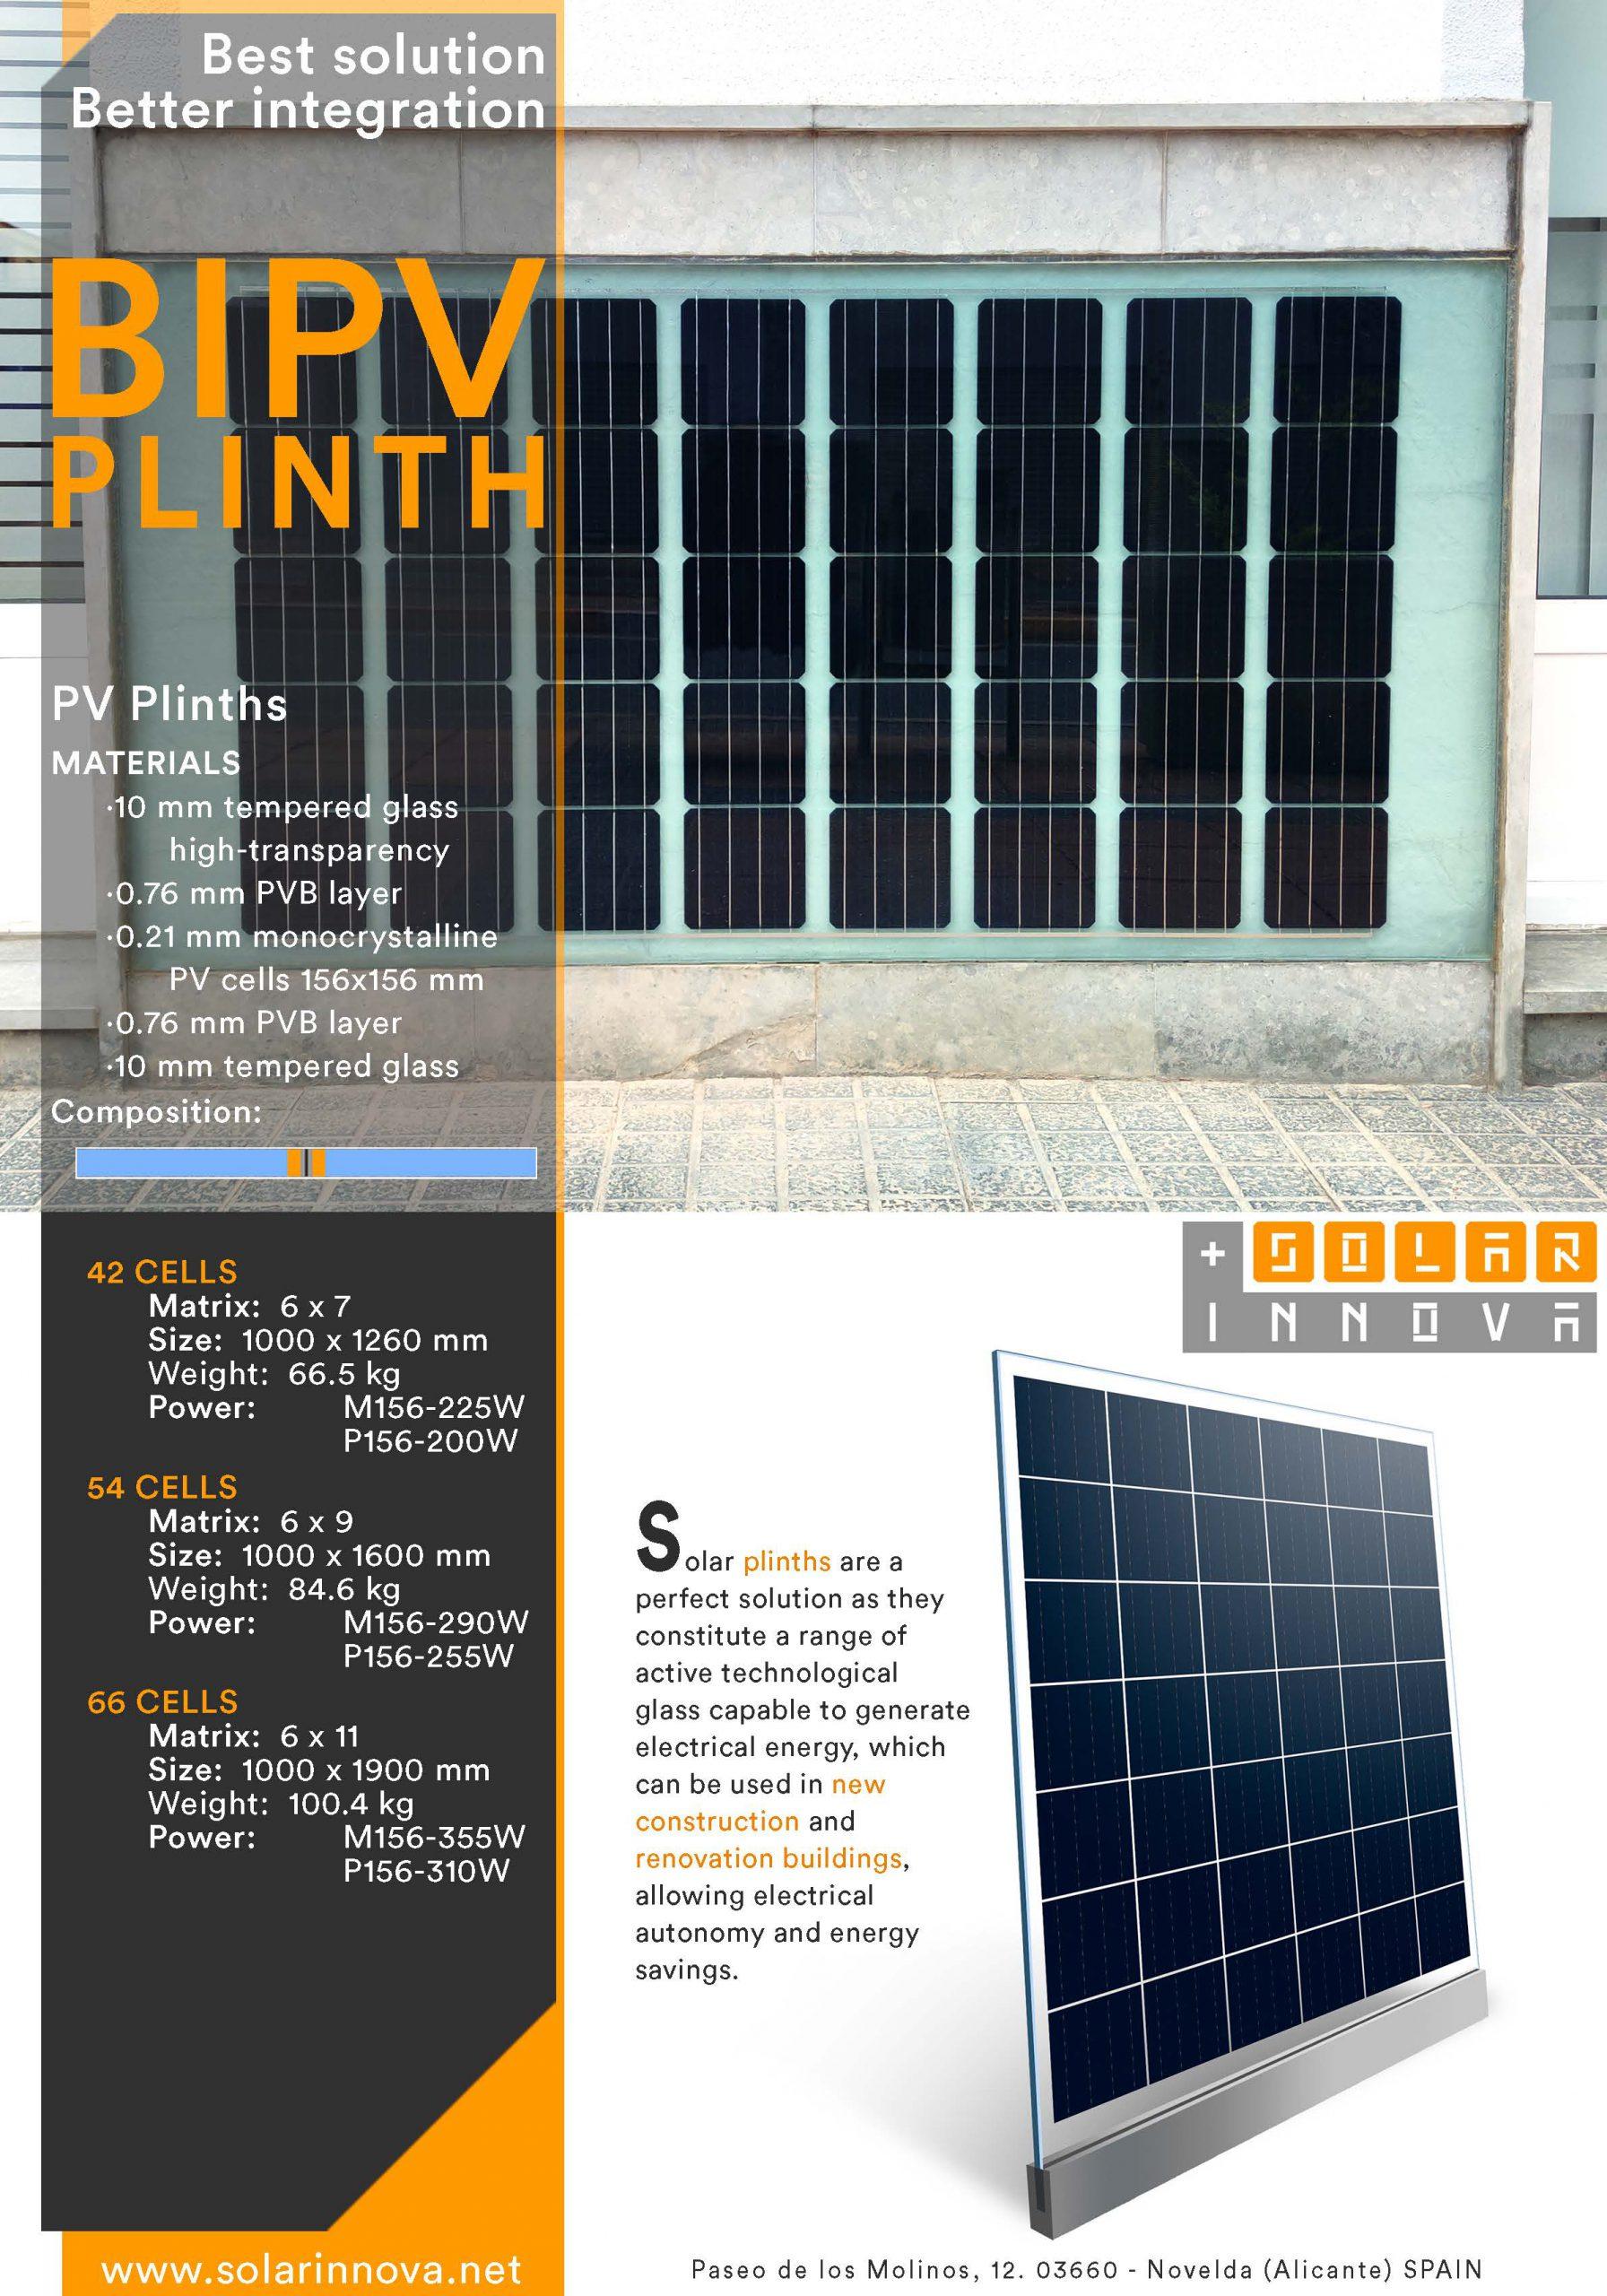 https://solarinnova.pl/wp-content/uploads/2021/04/katalog-2021-bipv-cokol-en_Strona_1-scaled.jpg